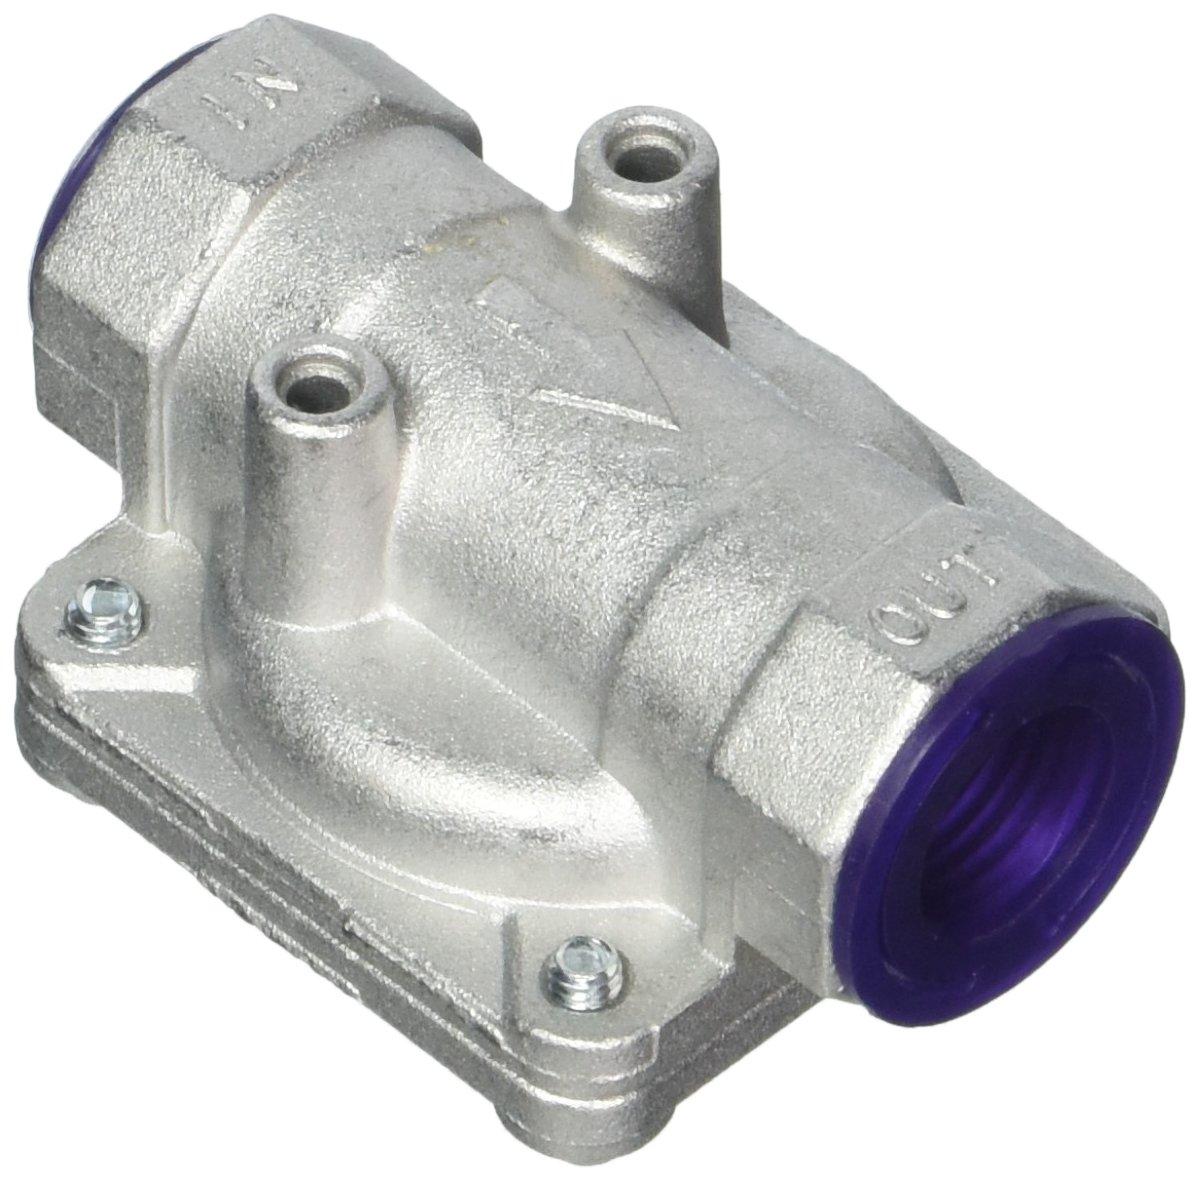 Atwood (51062) Pressure Regulator